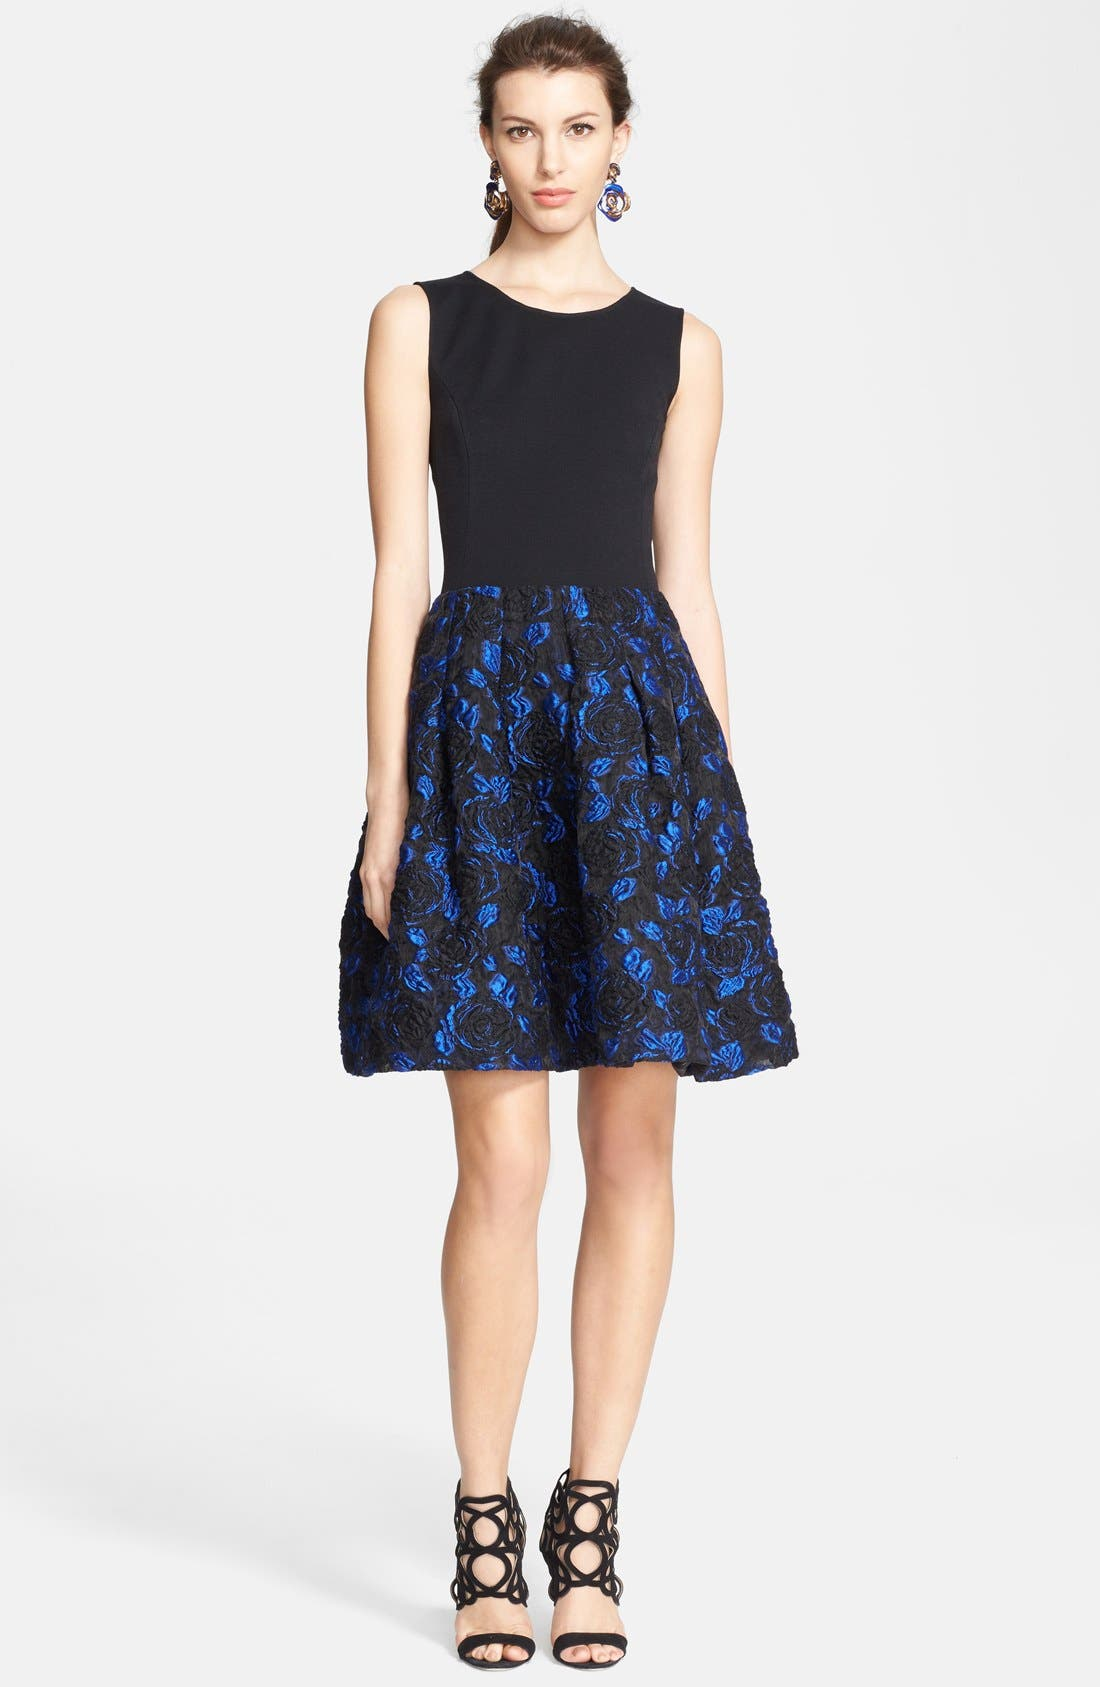 Alternate Image 1 Selected - Oscar de la Renta Jacquard Skirt Fit & Flare Dress